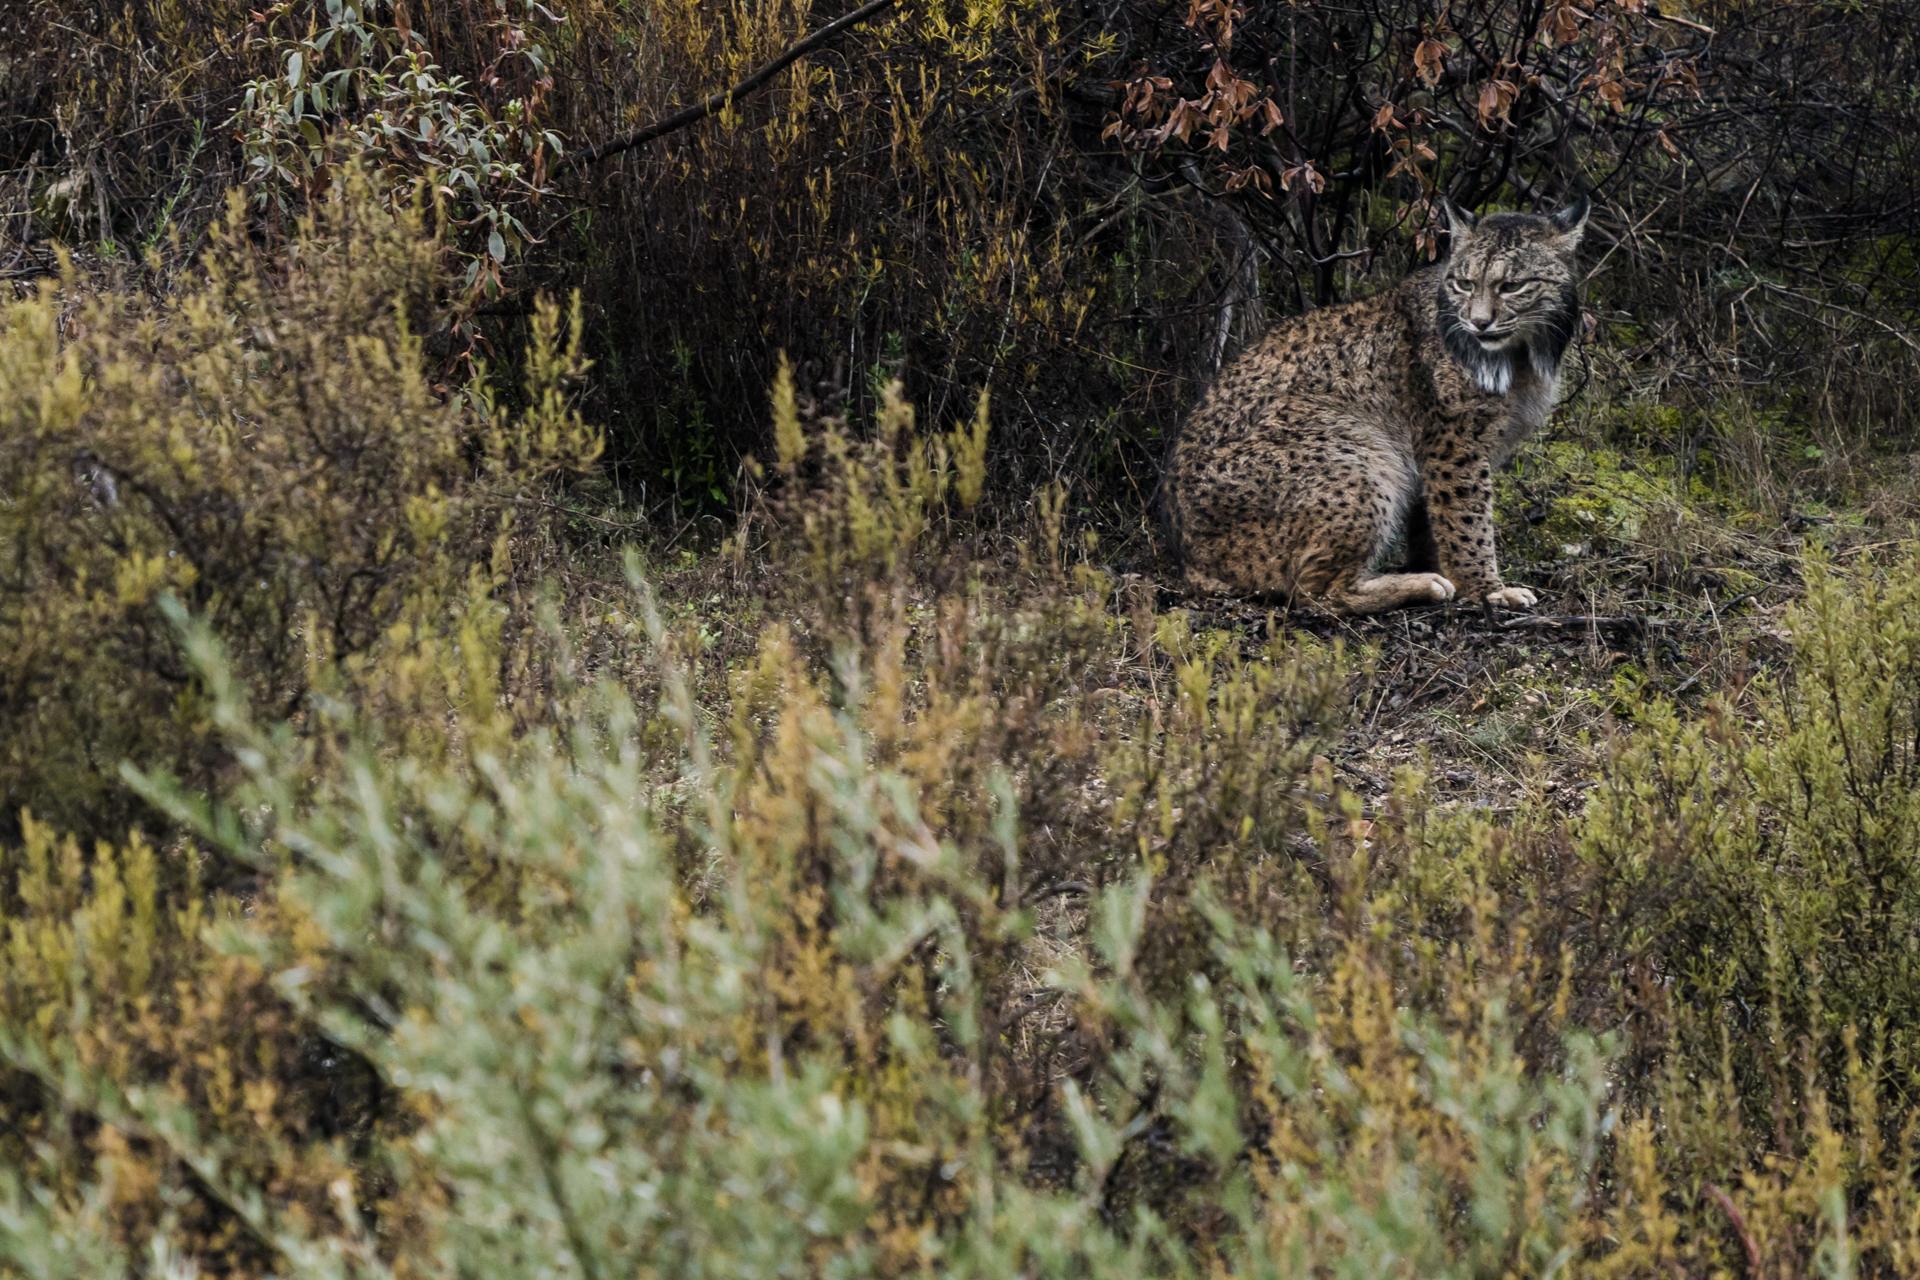 The rarest cat in the world, an Iberian lynx.